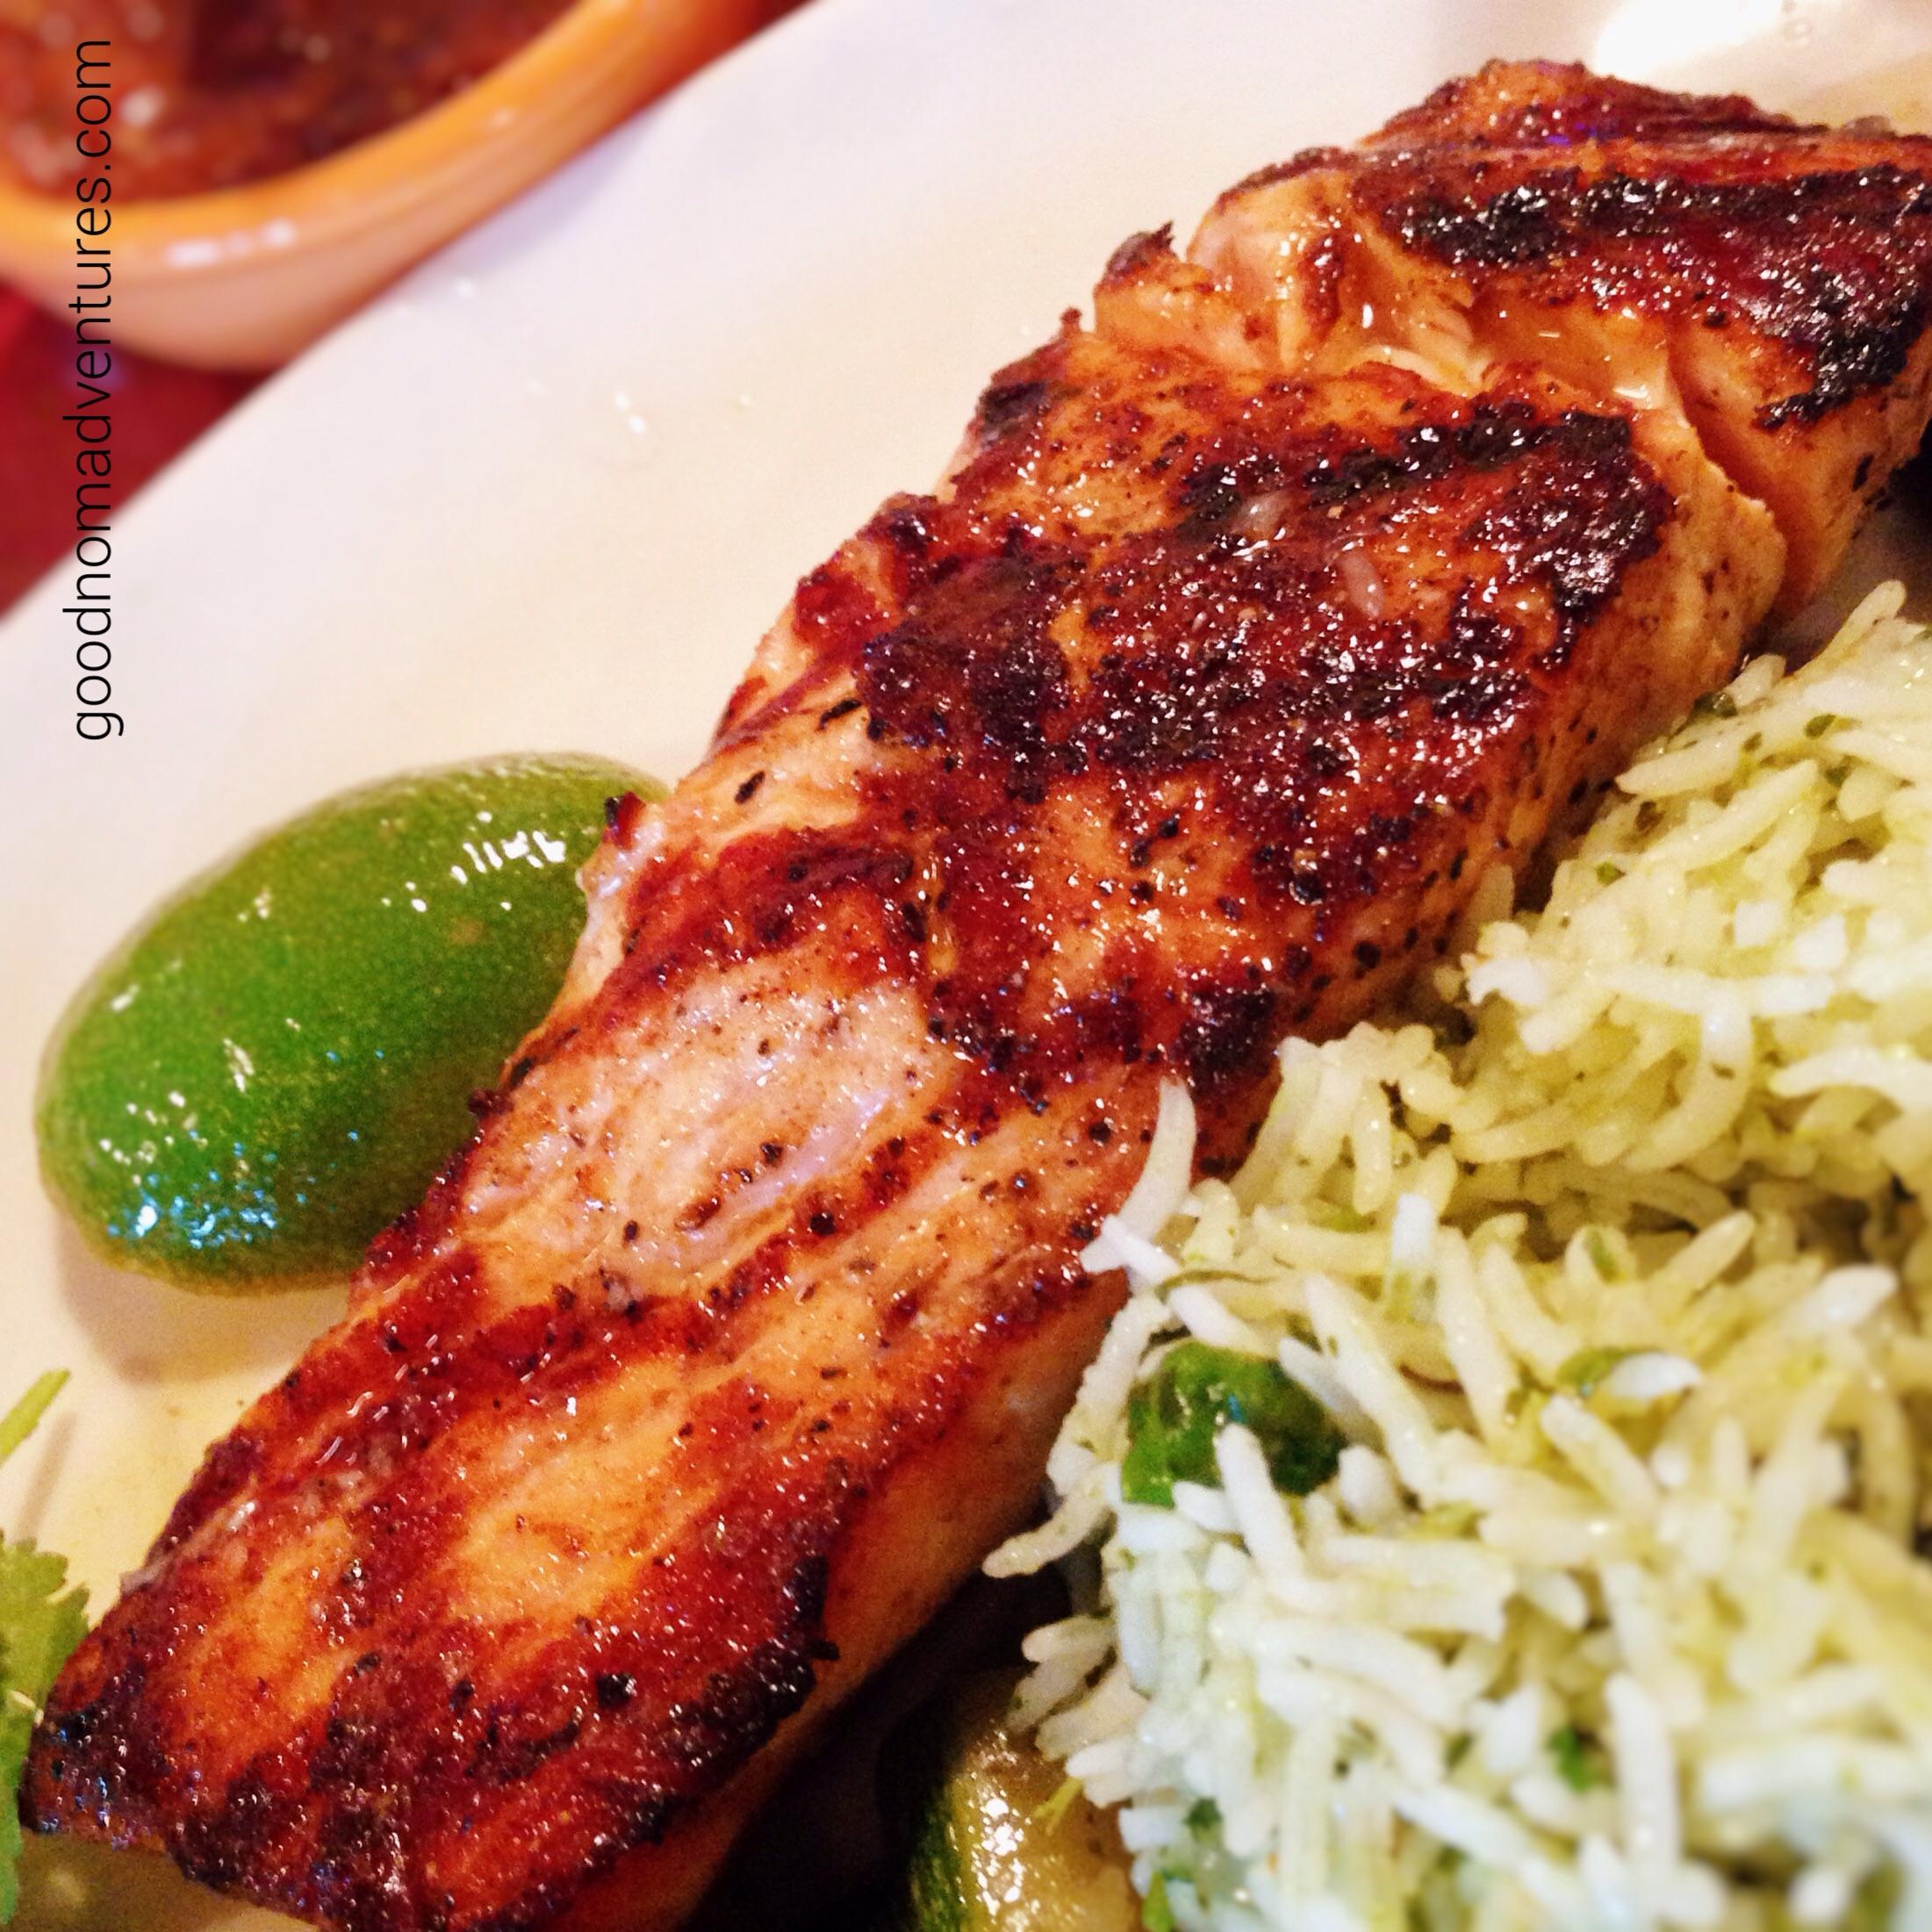 Mesquite-grilled salmon and cilantro rice